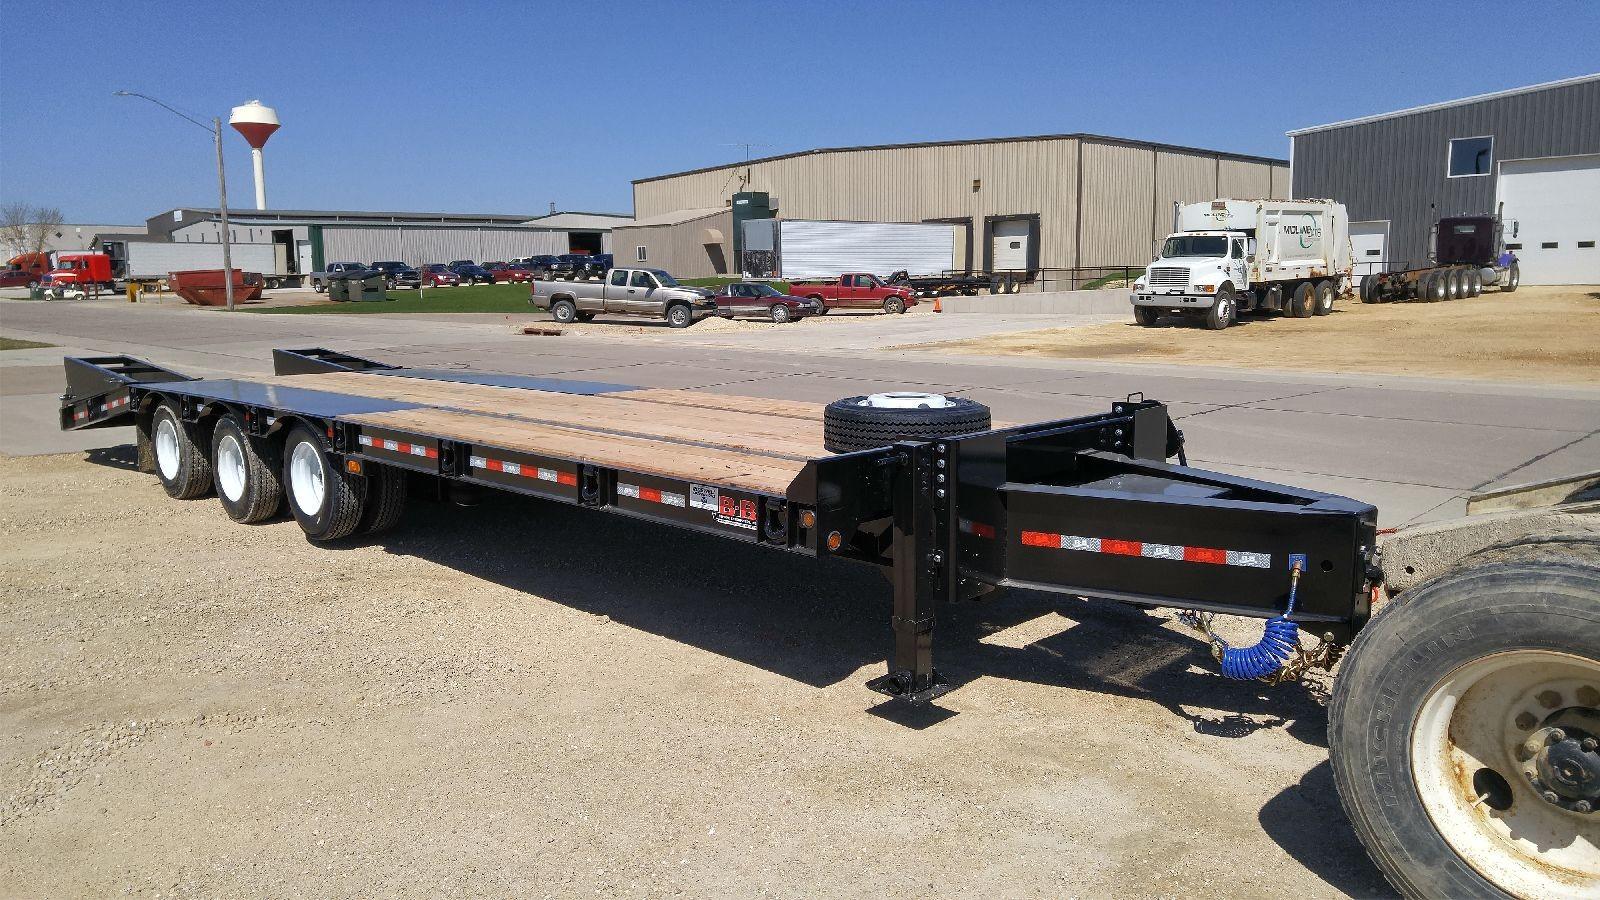 Heavy Duty Tractor Trailer : Heavy equipment flatbed trailers by behnke